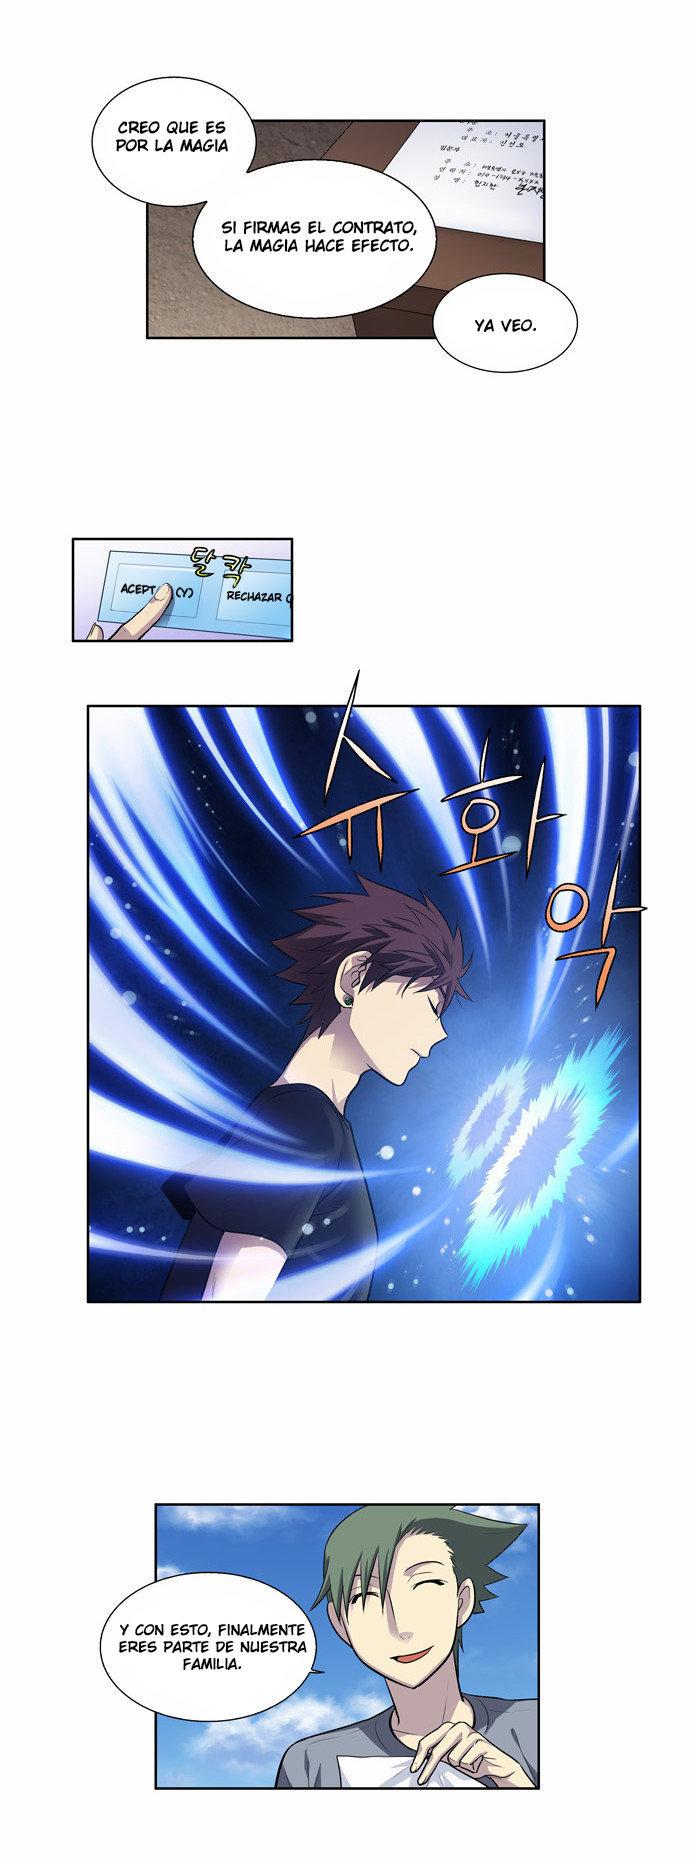 http://c5.ninemanga.com/es_manga/61/1725/446811/992fbfcd780c3f522308d44f1b13ee19.jpg Page 7